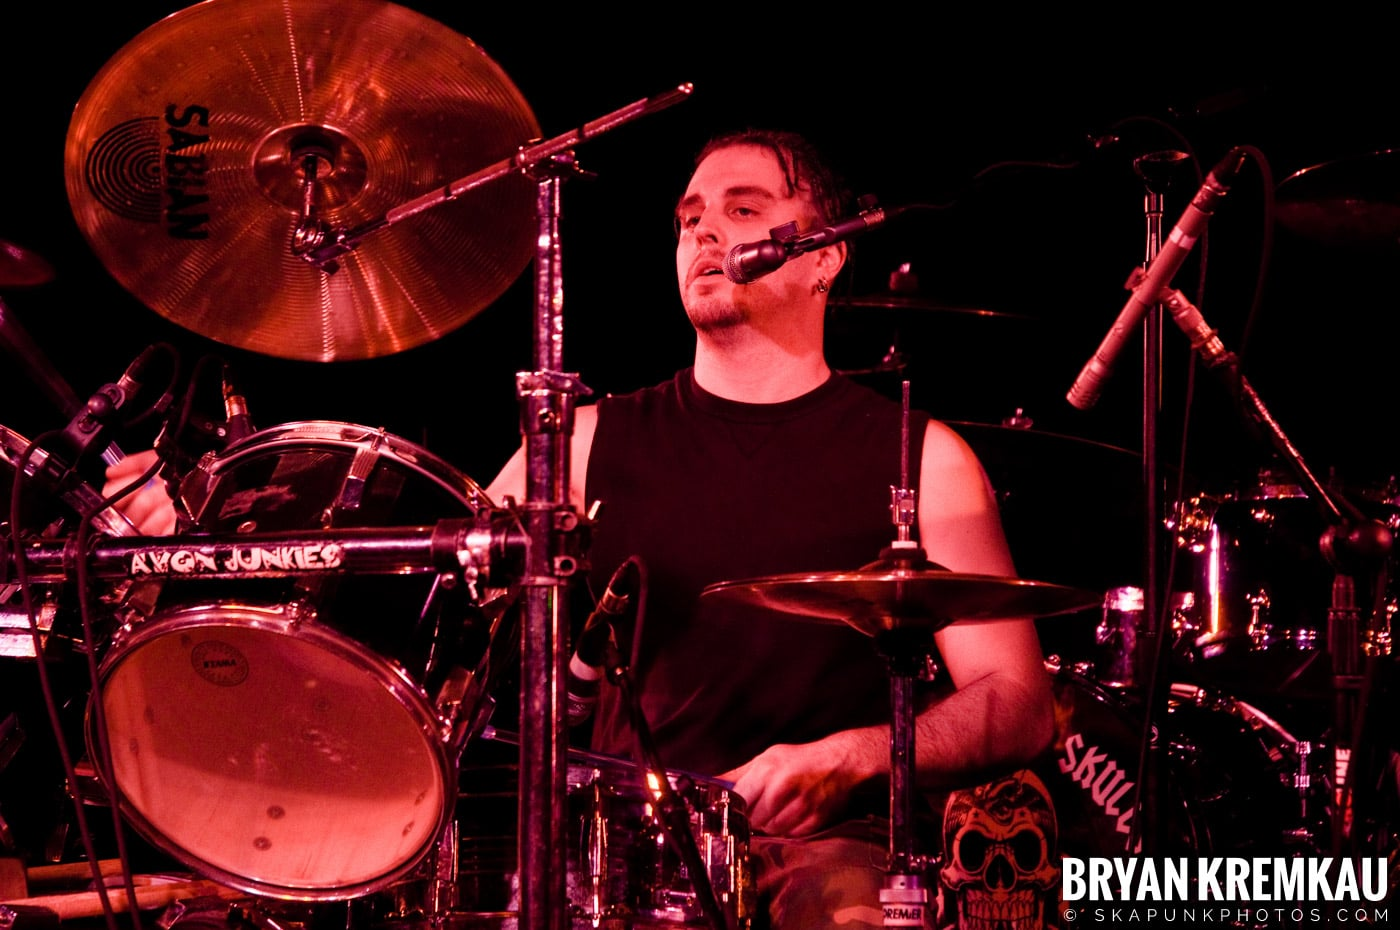 Avon Junkies (Ska is Dead Tour) @ Starland Ballroom, Sayreville, NJ - 11.15.09 (9)